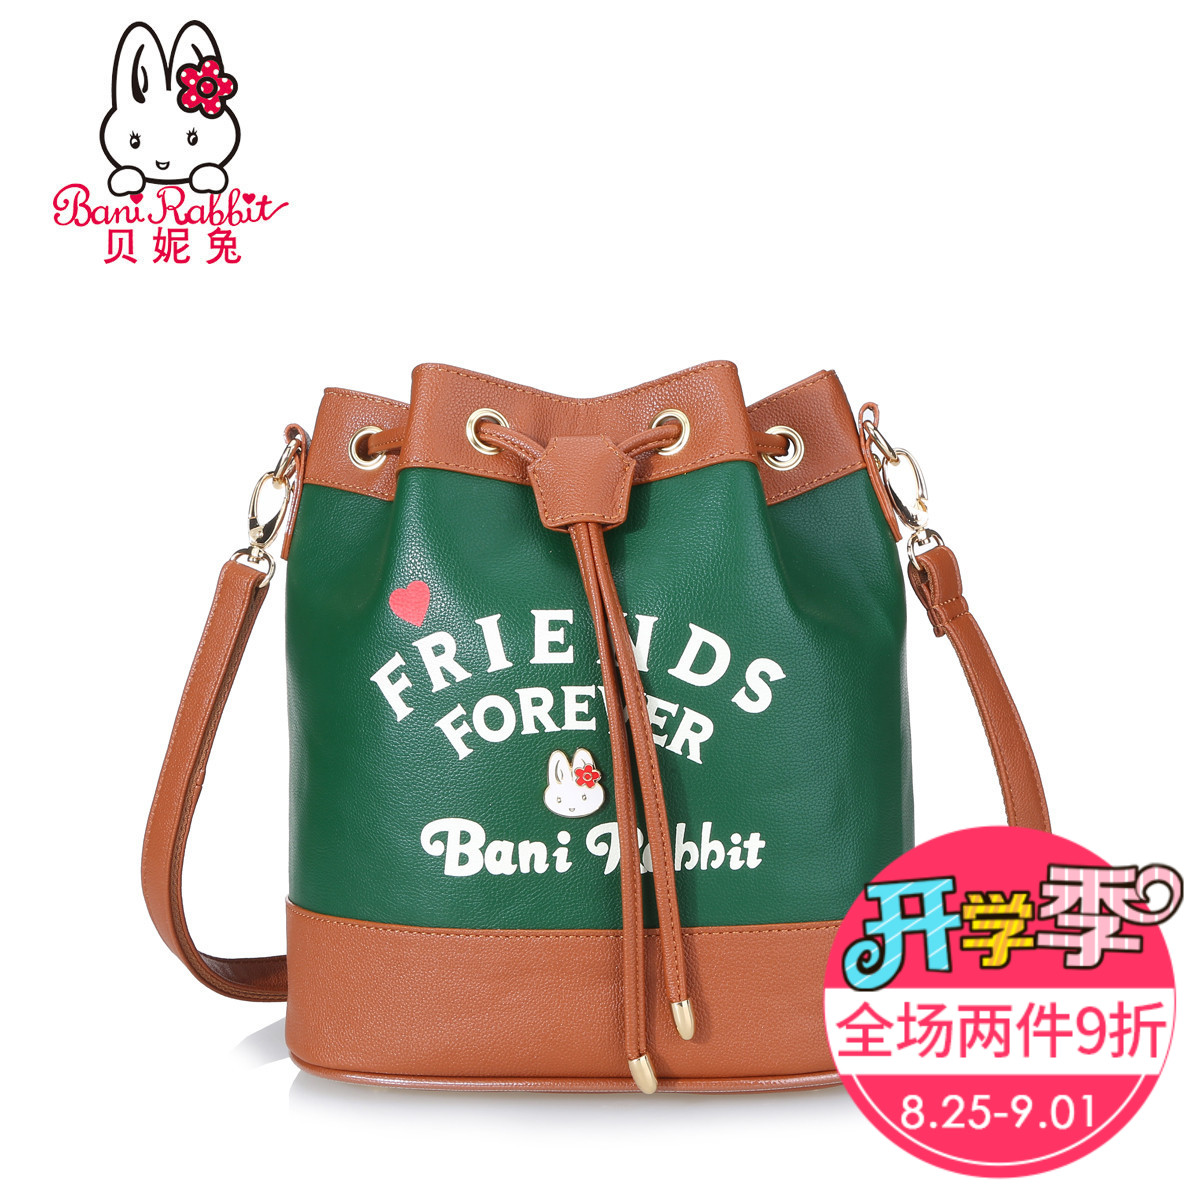 13d9a06f8fefb Get Quotations · Beini rabbit 2016 new handbag bucket bag drawstring bucket  bag simple fashion handbags shoulder messenger bag